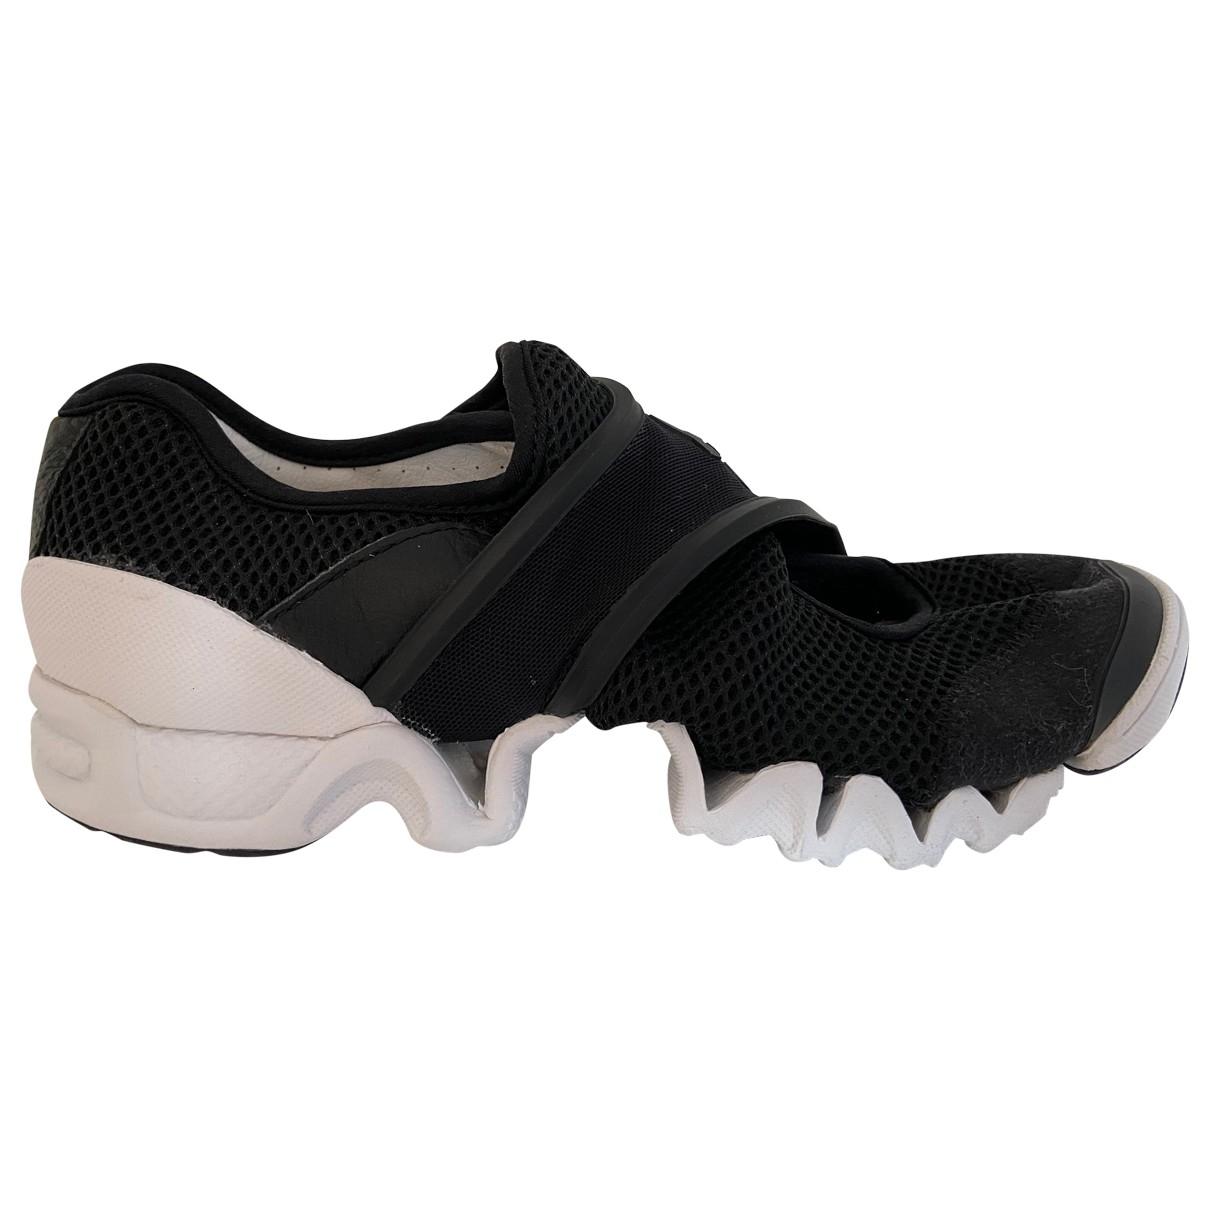 Y-3 \N Black Trainers for Women 38.5 EU